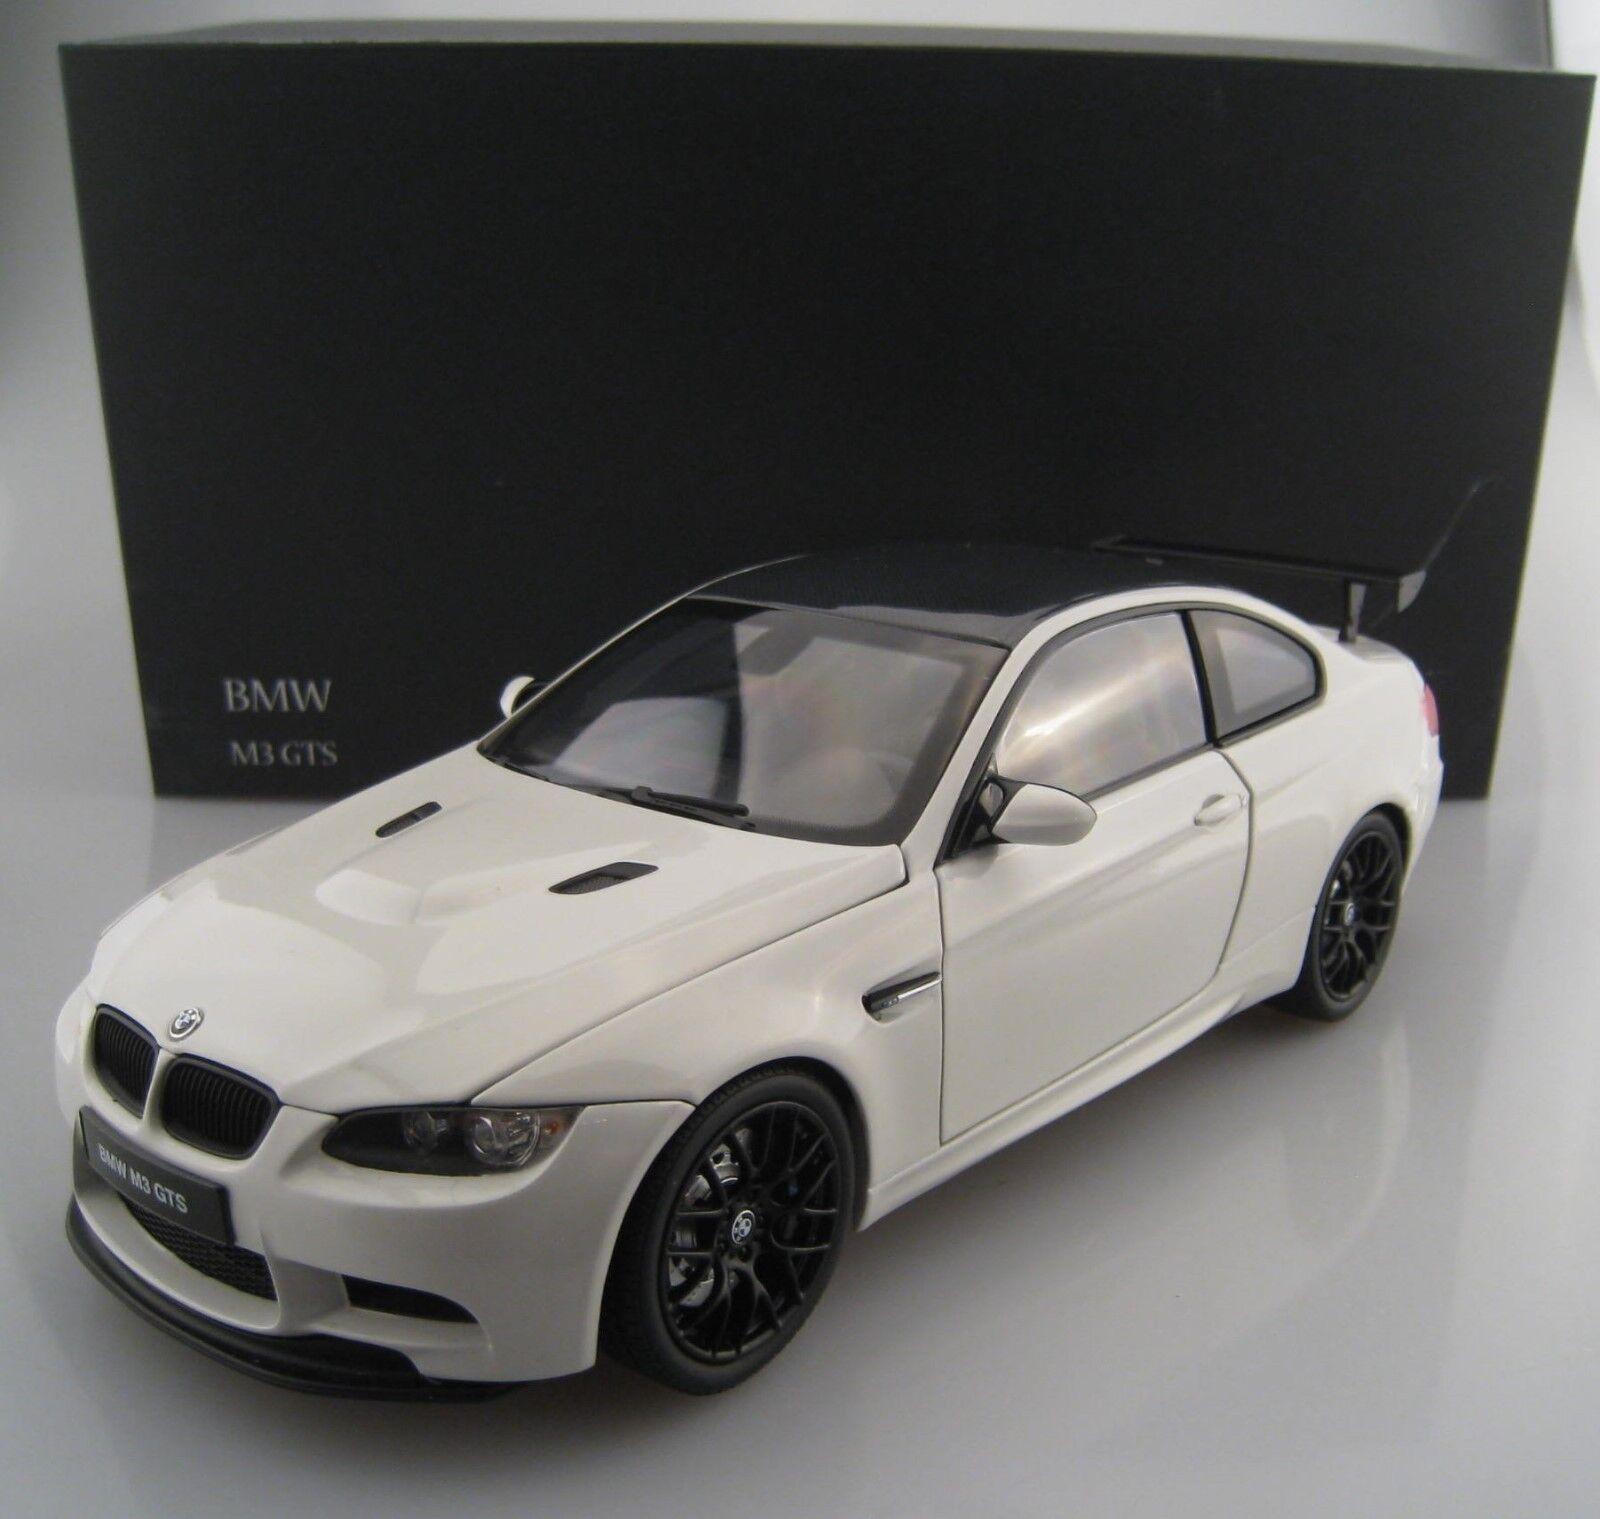 BMW m3 GTS dans Alpine Blanc KYOSHO échelle 1 18 neuf dans sa boîte NEUF